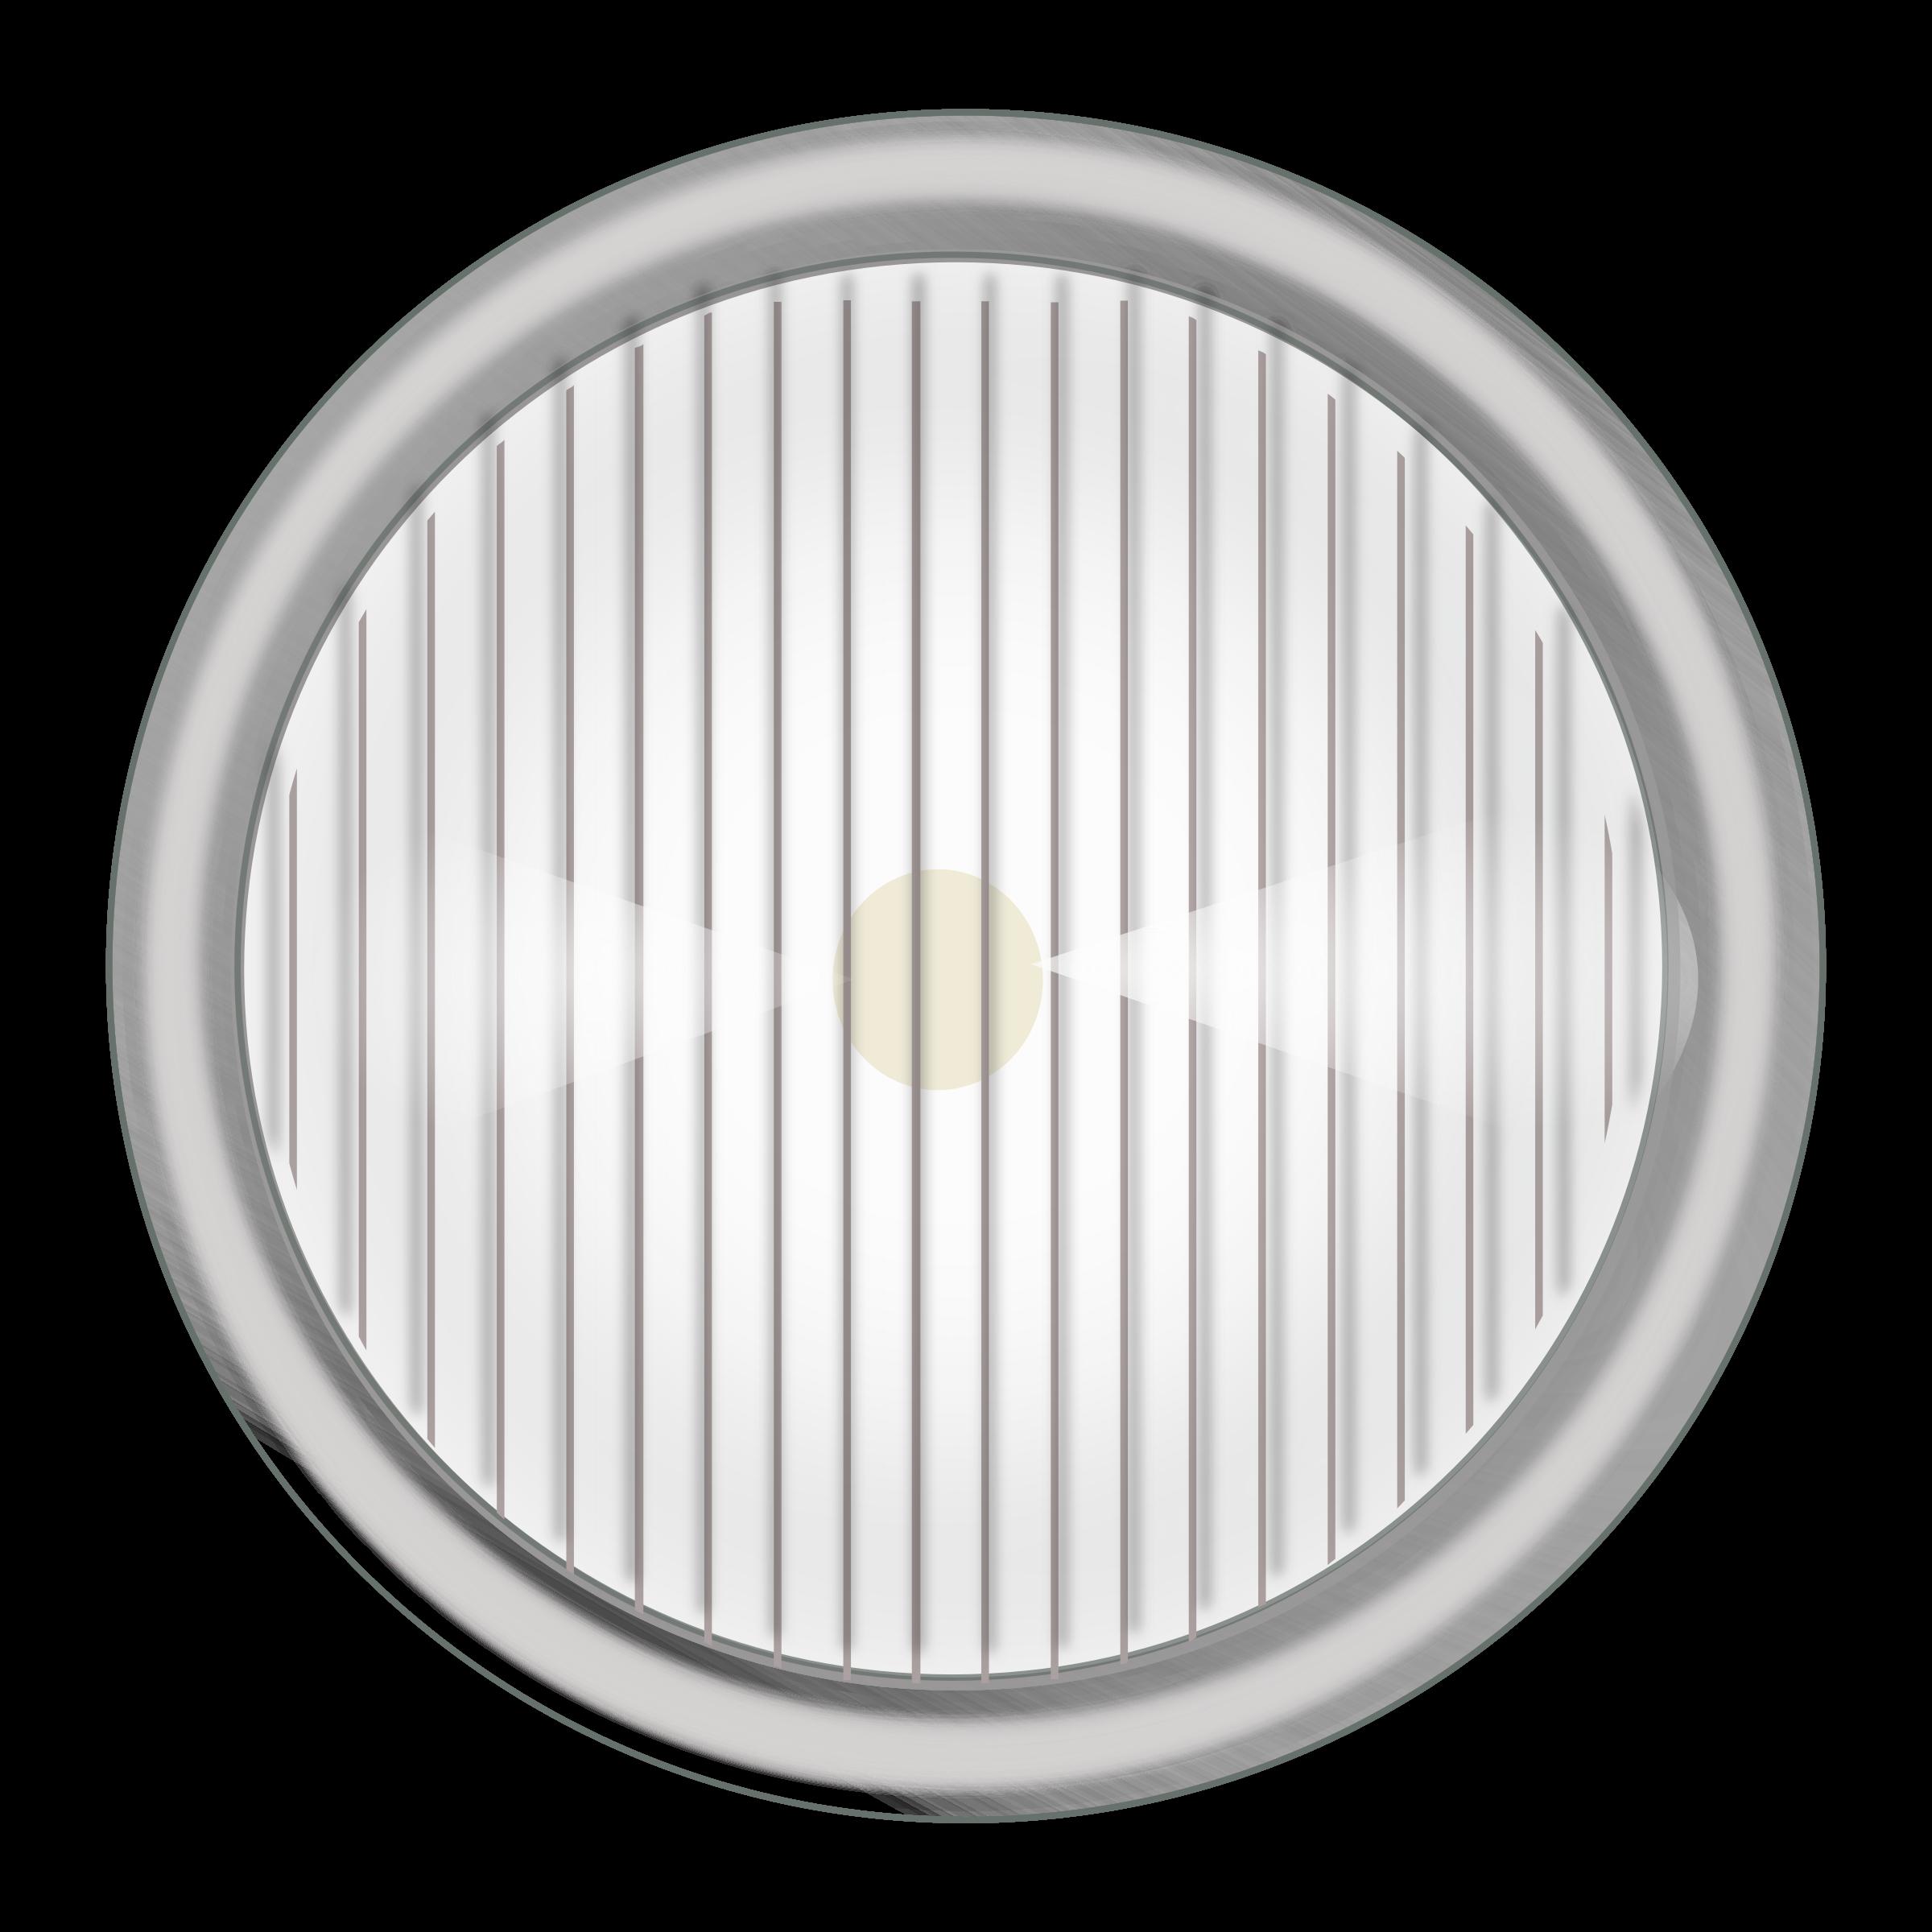 Car headlight clipart banner library Clipart - car-headlight banner library